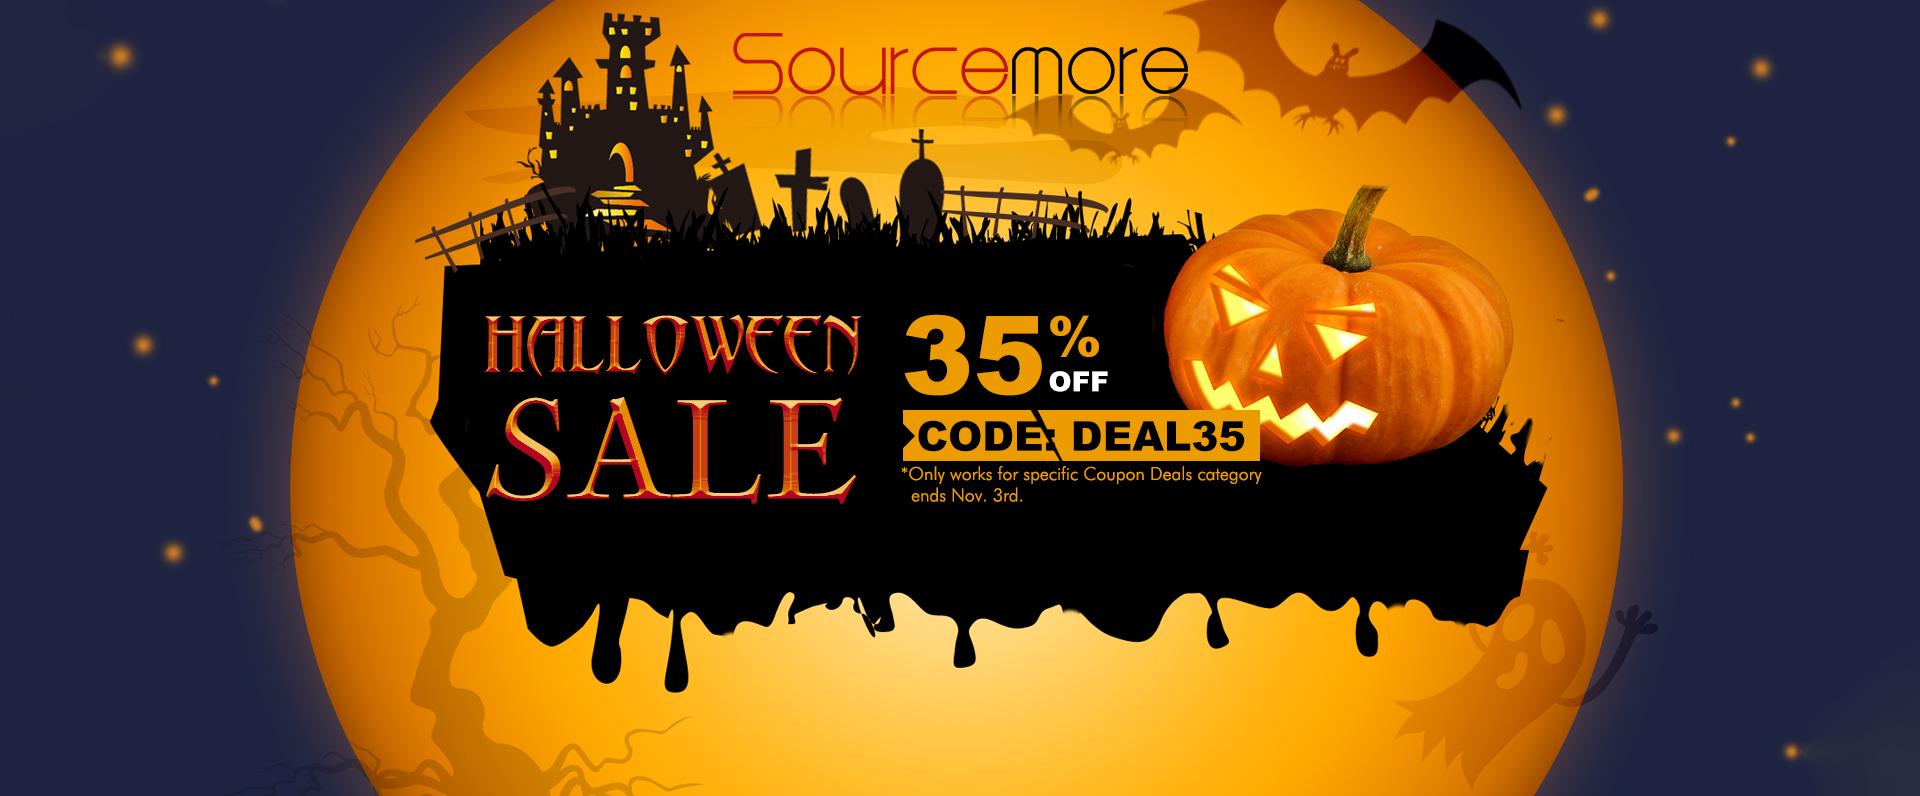 Sourcemore Halloween Sale zB. asMODus Spruzza 80W Squonk Kit